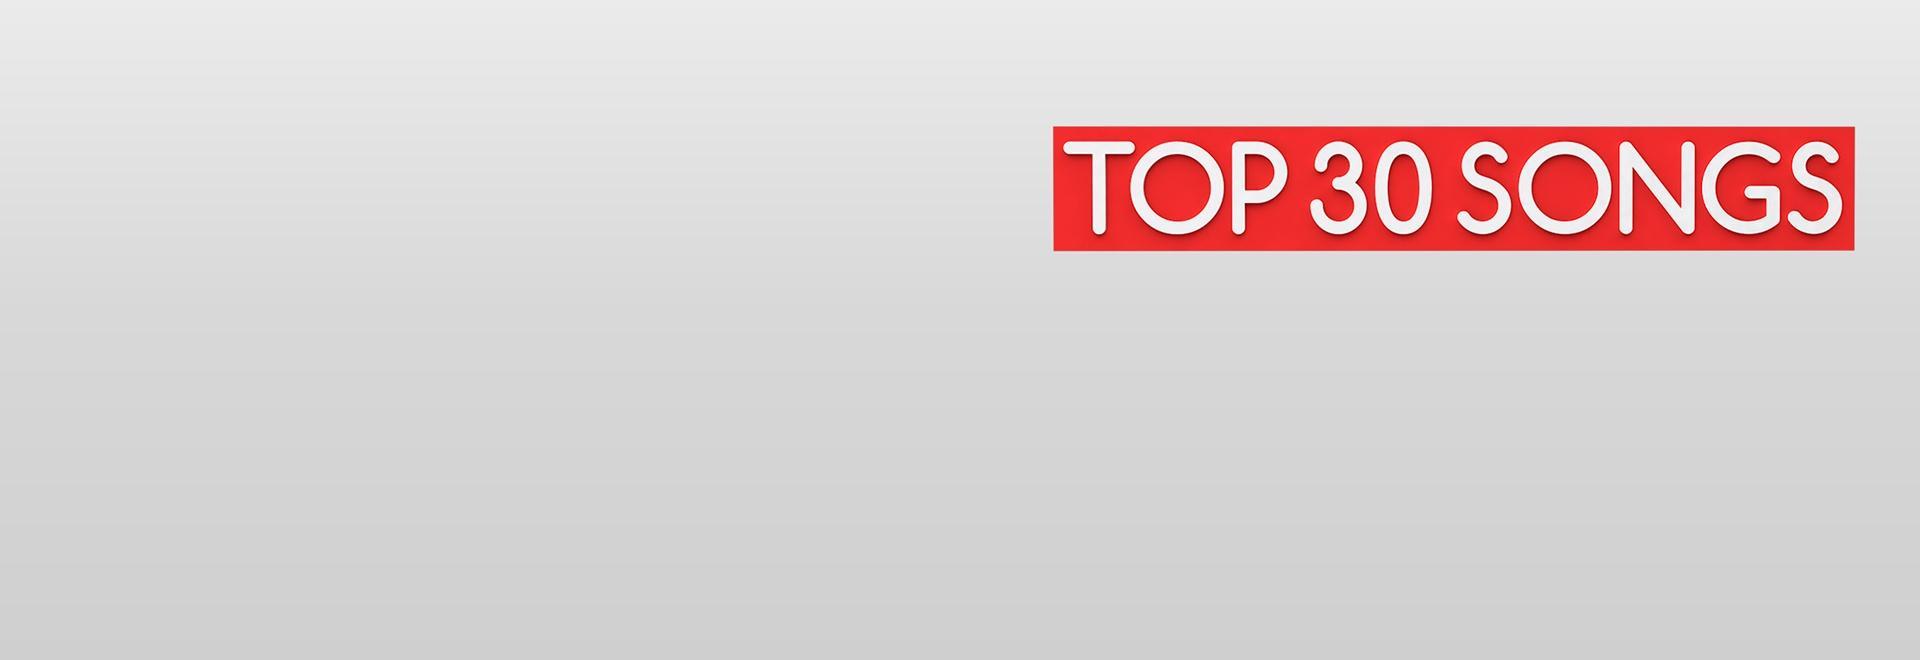 Top 30 Songs - Playlist 8